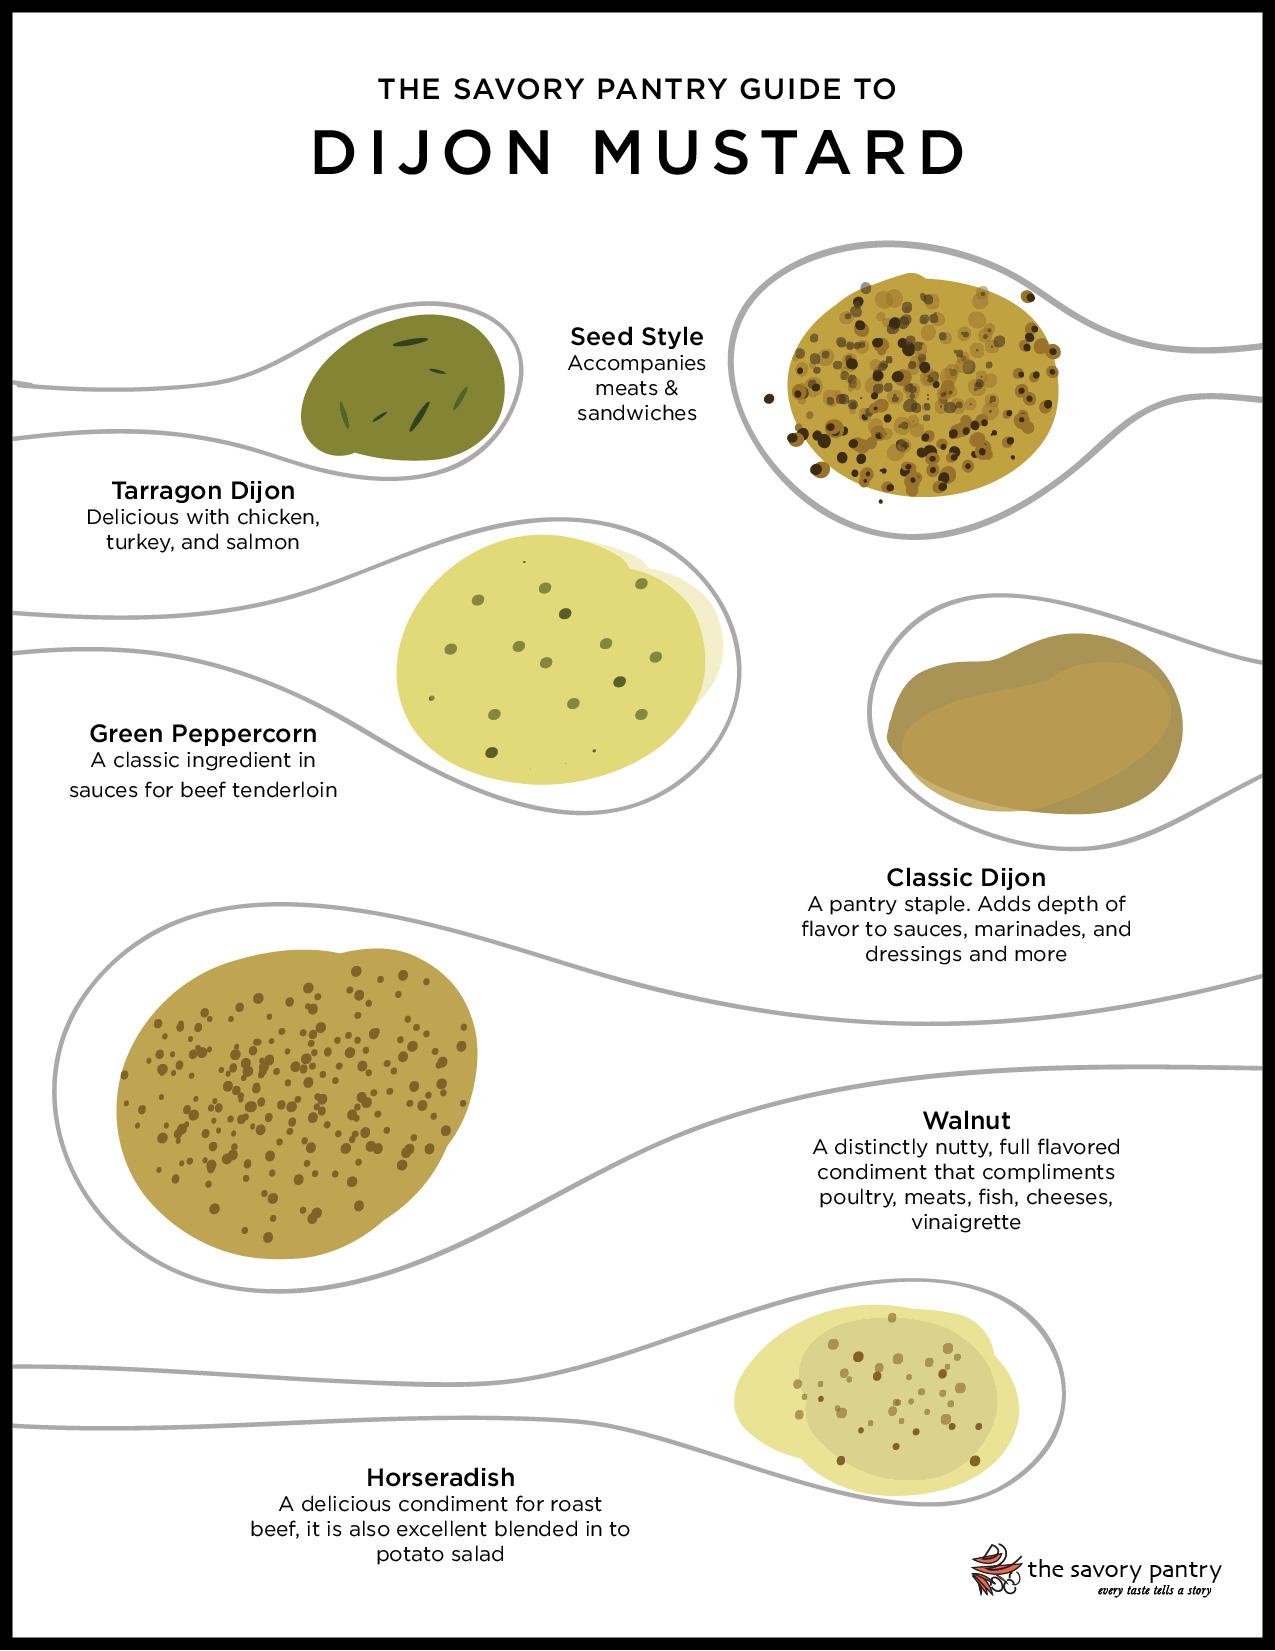 The Savory Pantry Guide to DIJON MUSTARD